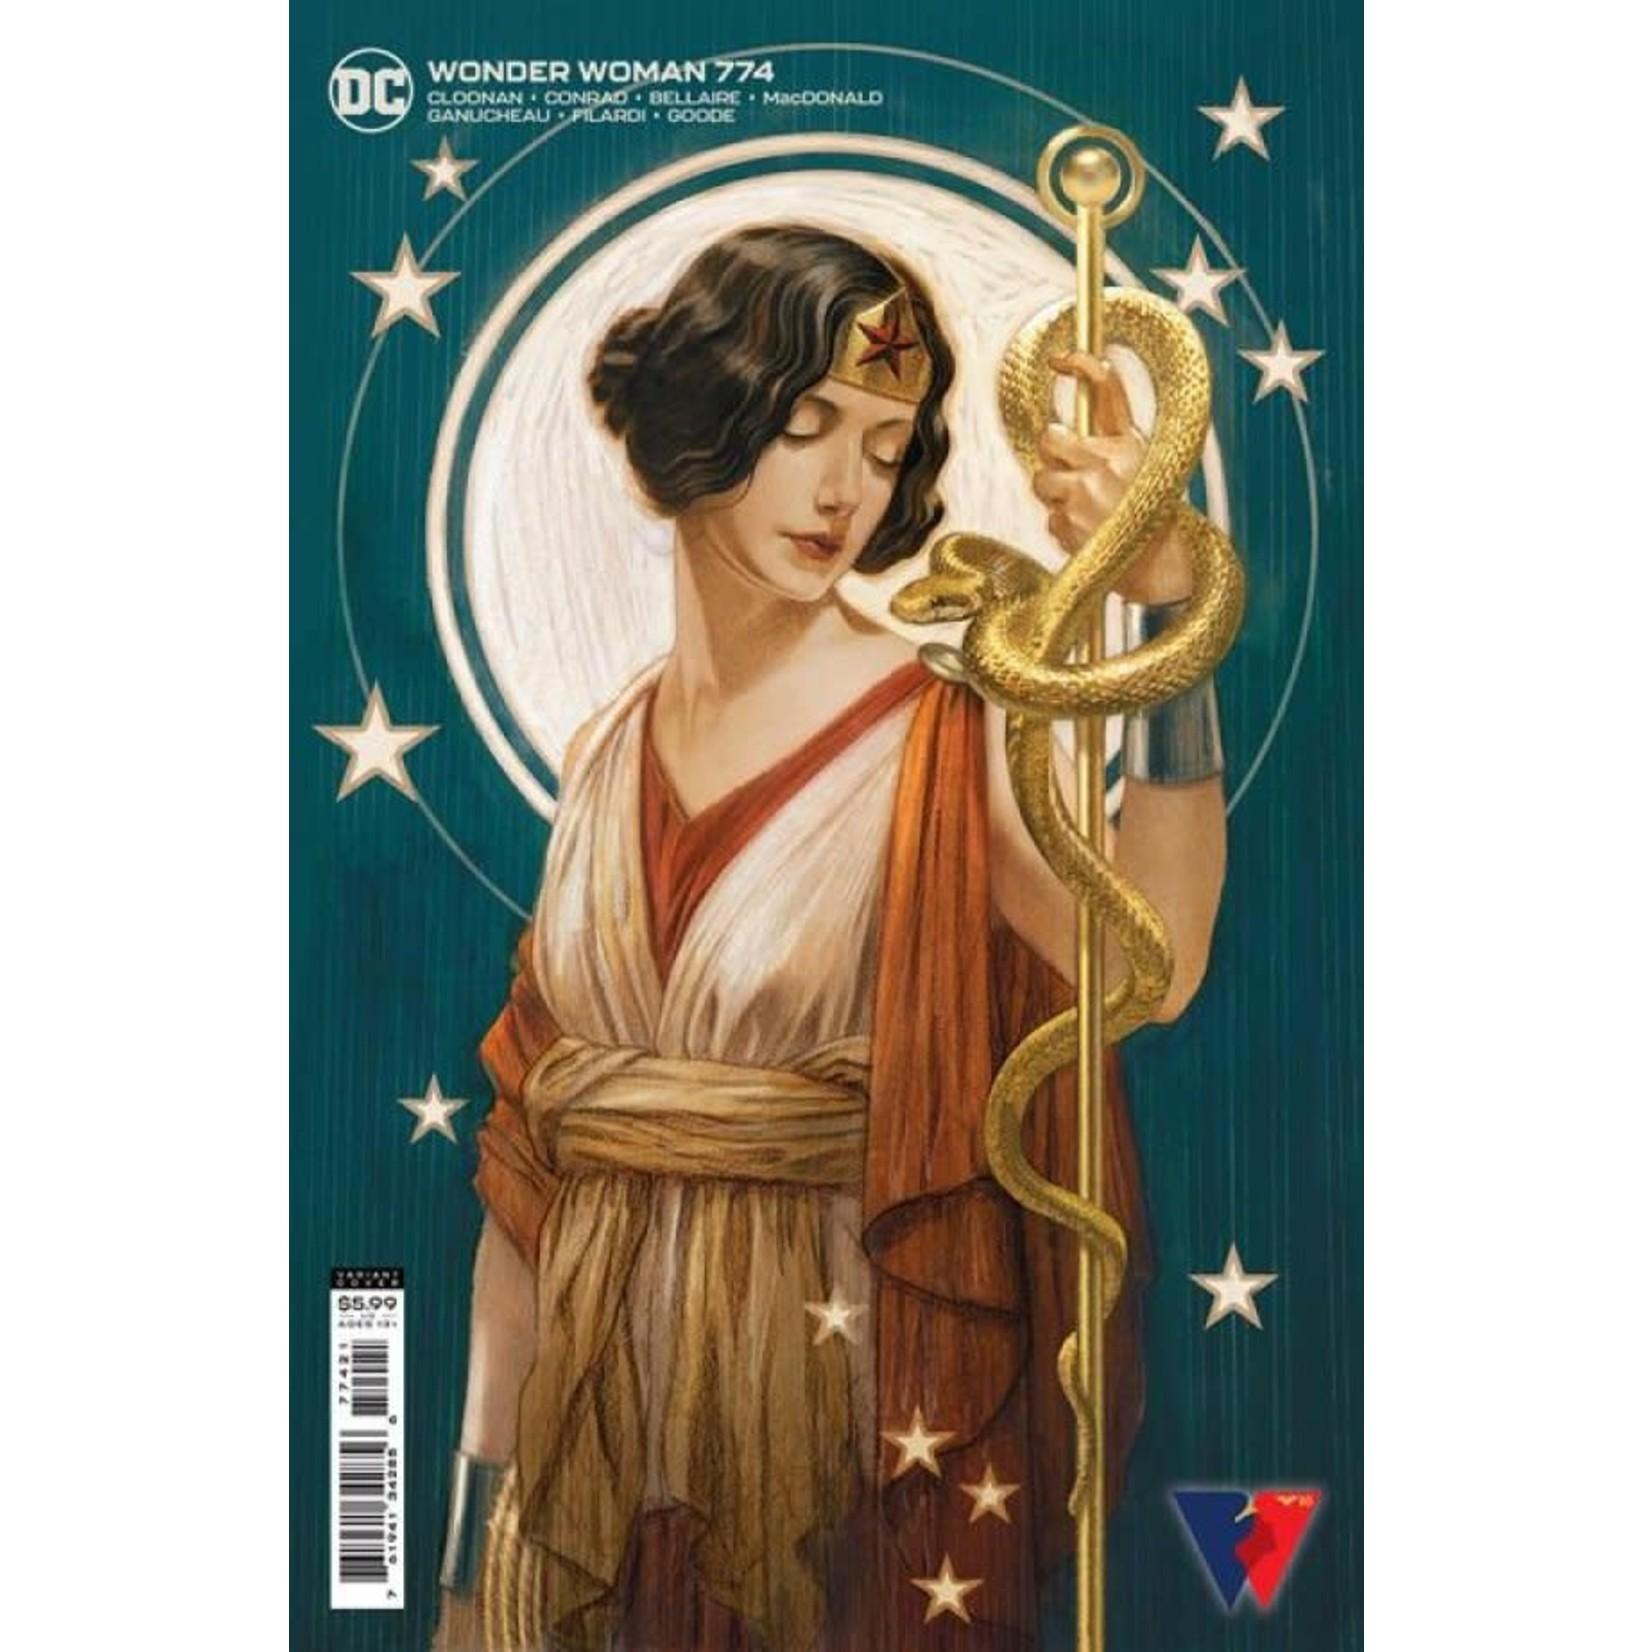 DC Comics Wonder Woman #774 Card Stock Variant Cover